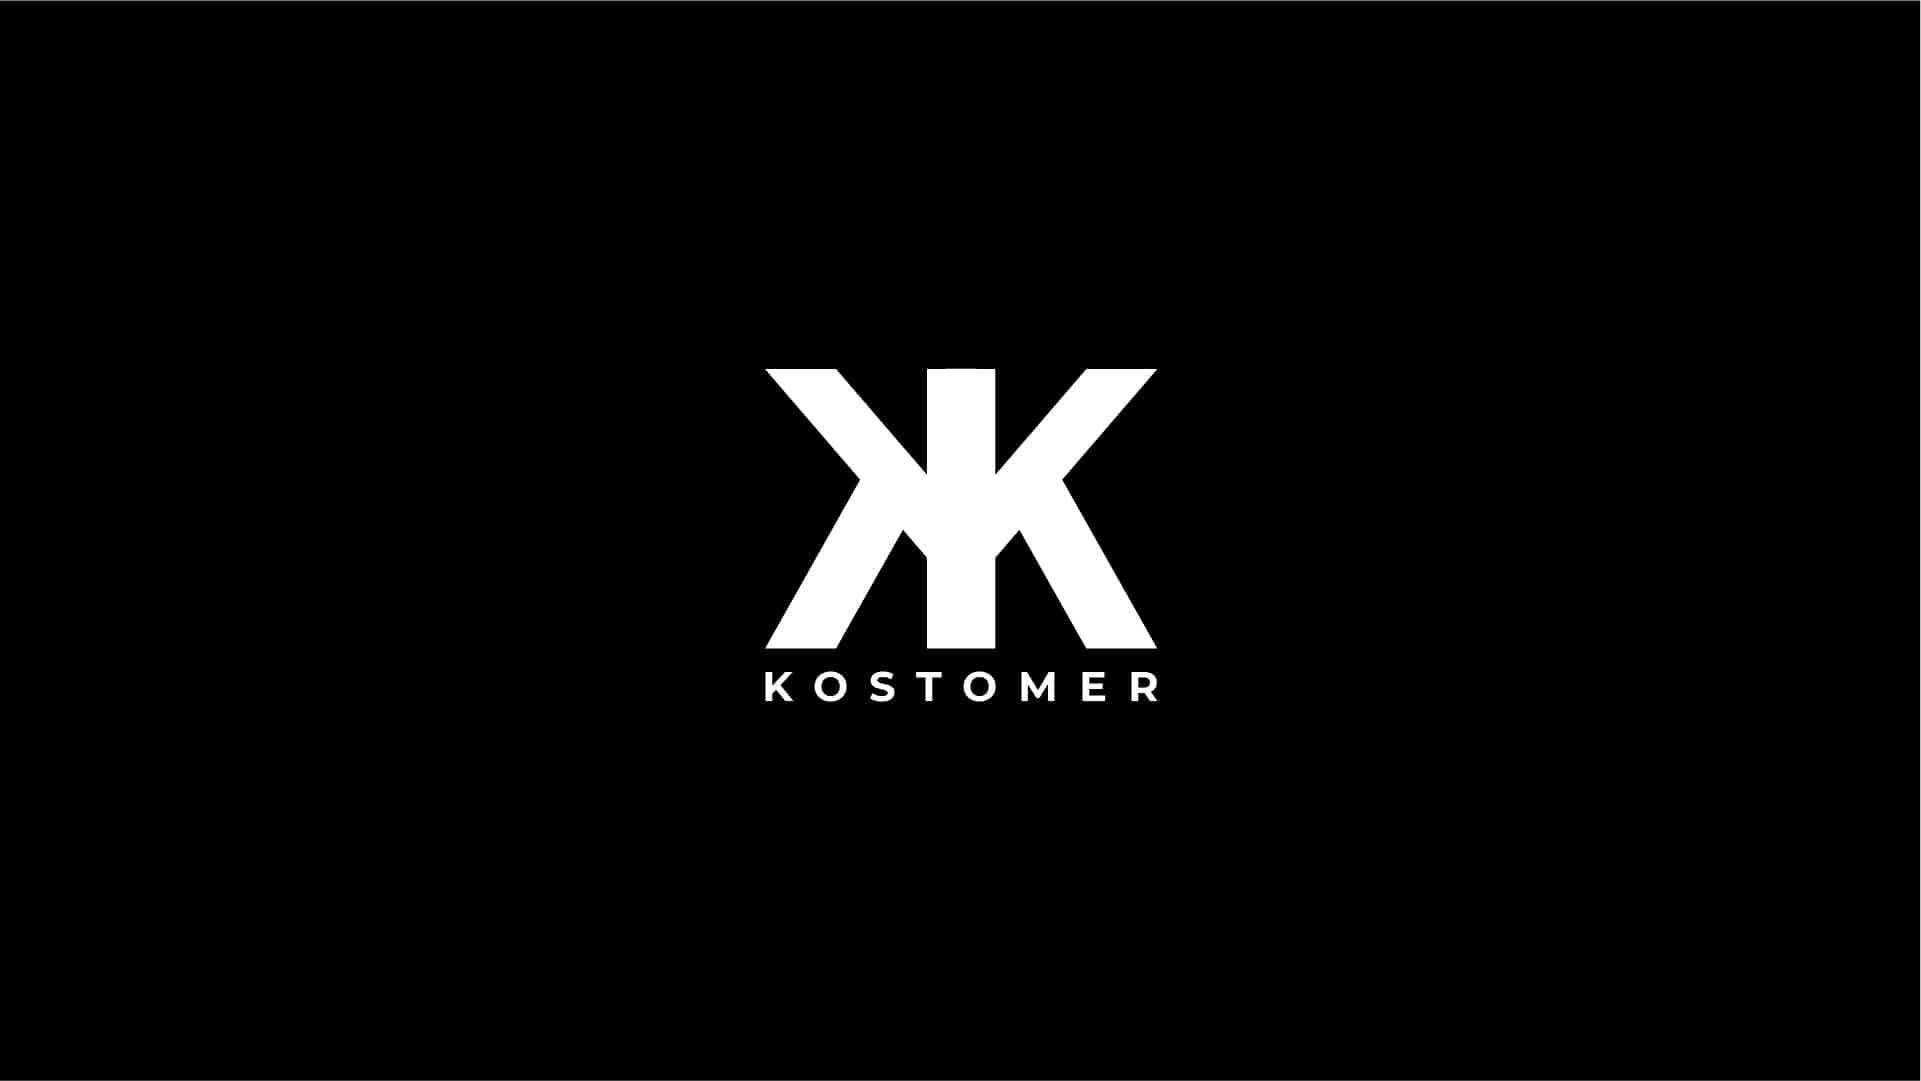 KOSTOMER-LOGO-MARK-AND-NAME